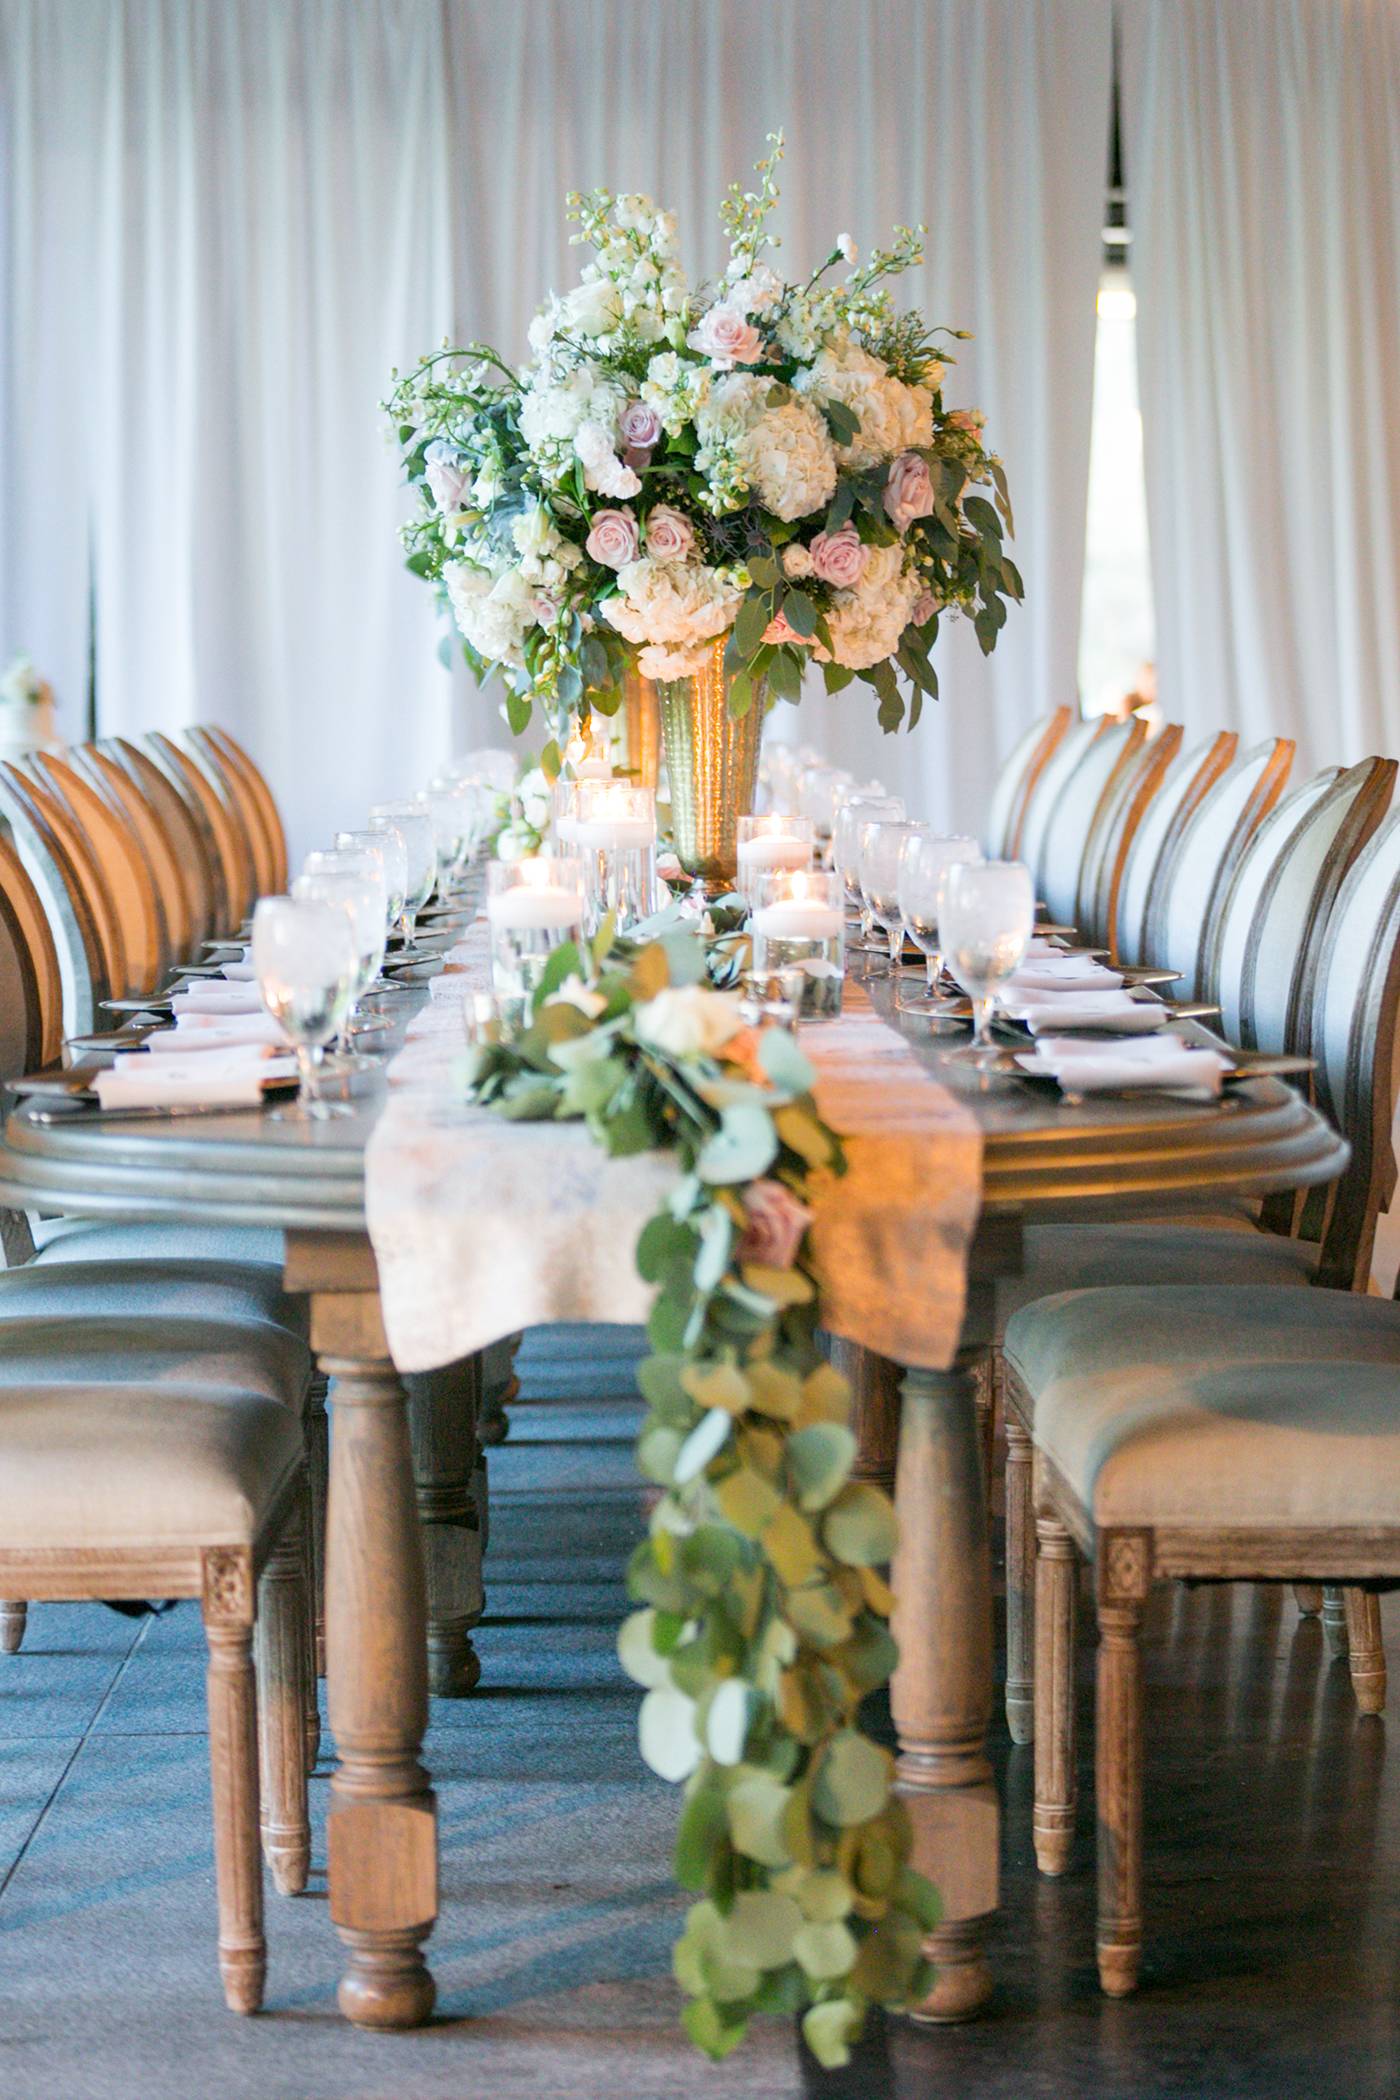 Wedding Planner Dallas TX - Allday Events - Highland Park - Marie Gabrielle Wedding - 66.jpg